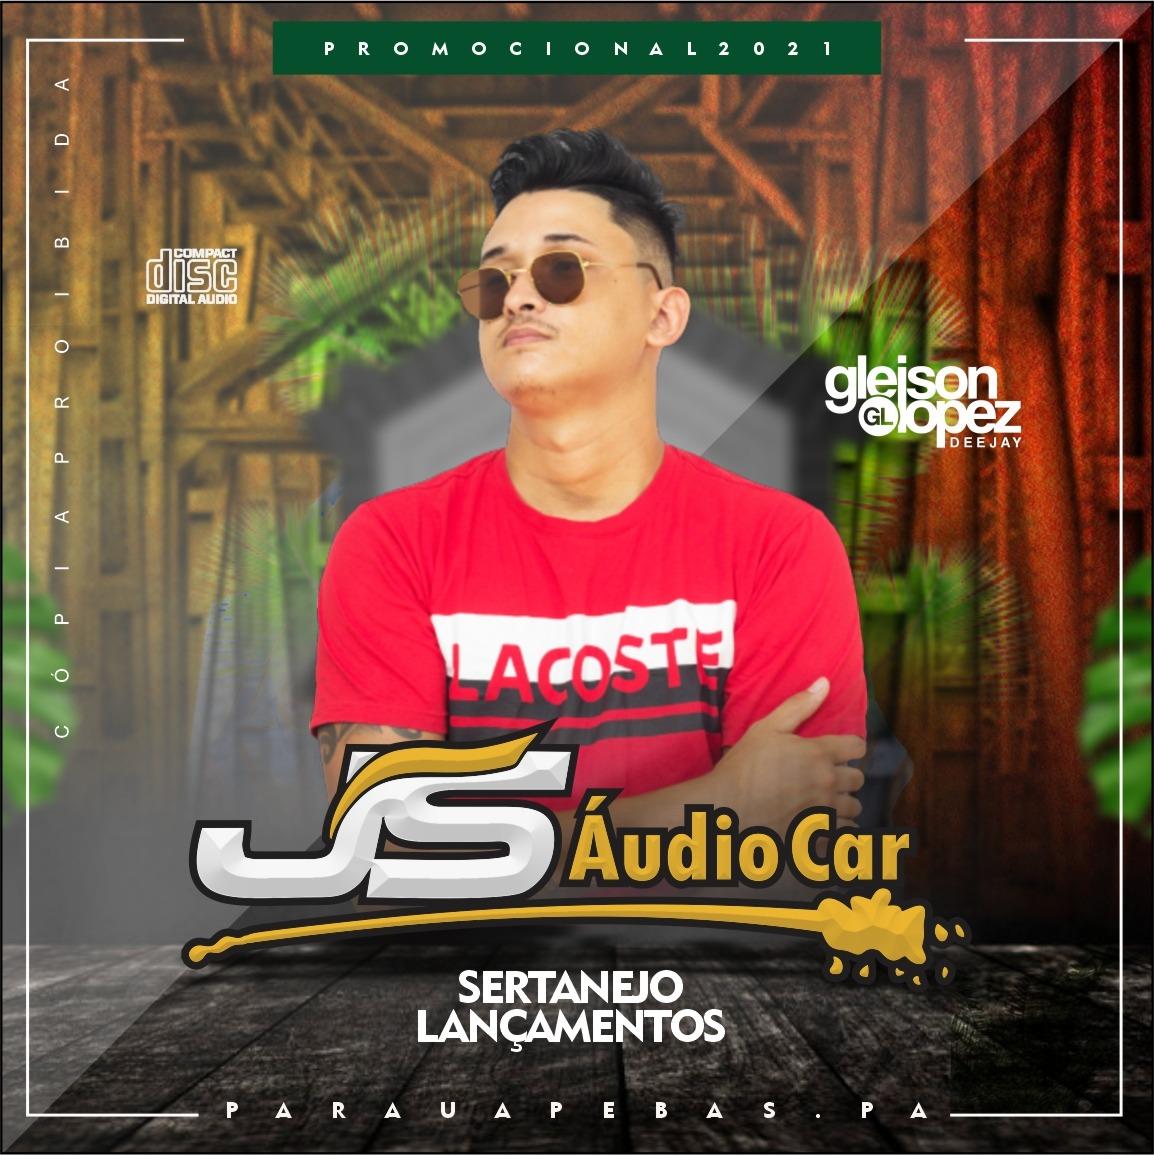 JS Audio Car - SERTANEJO 2021 - CD PROMOCIONAL